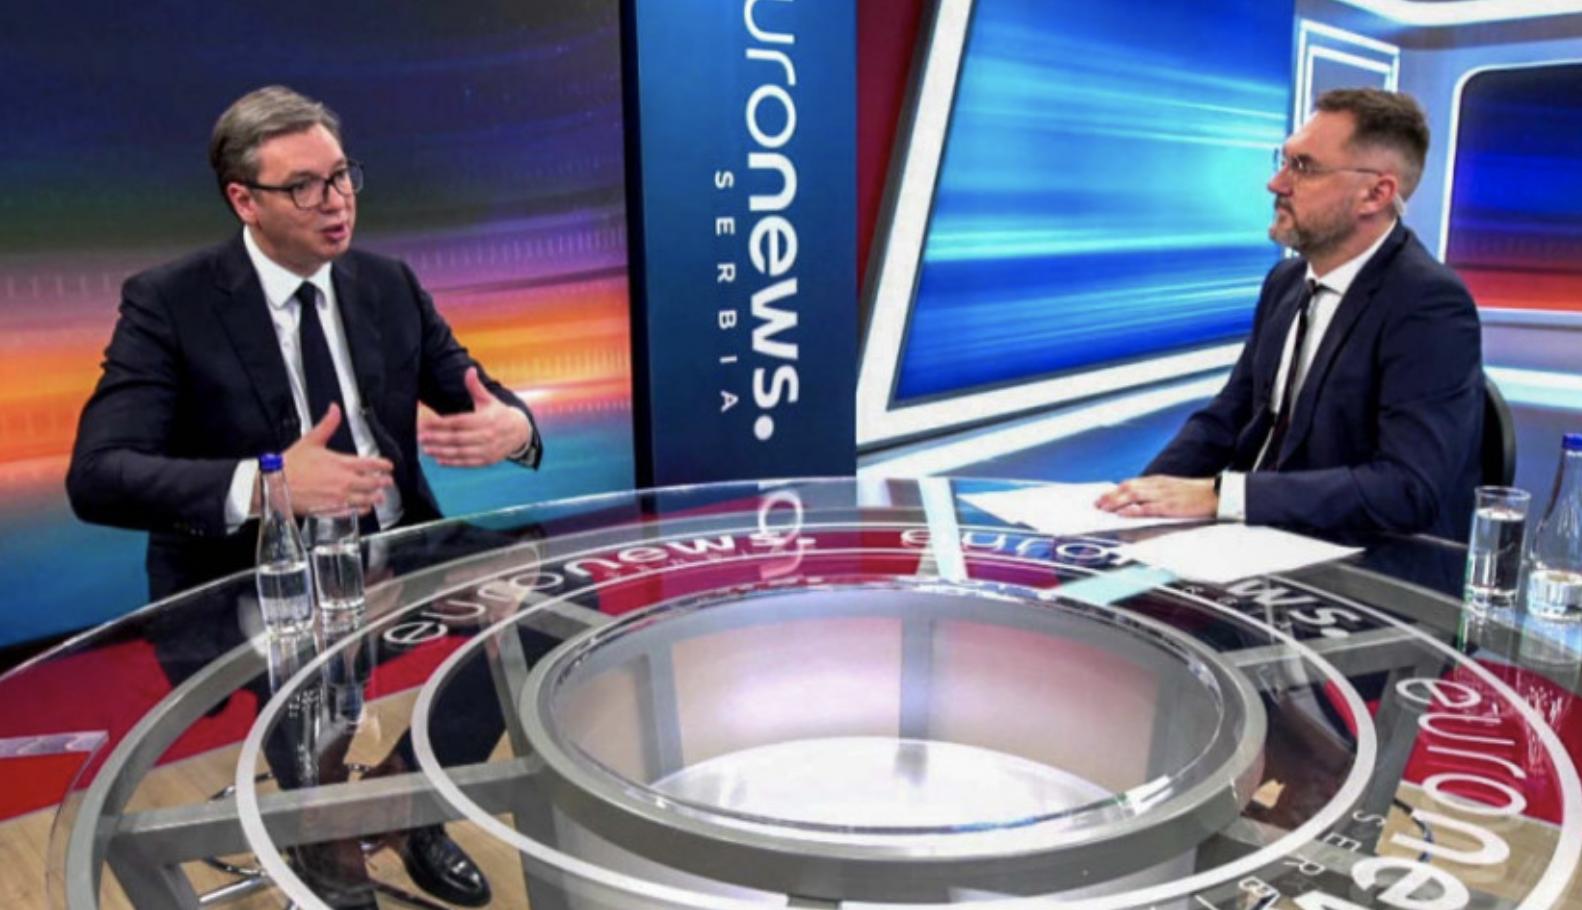 Vučić: Ο κόσμος θα αποφασίσει τον συμβιβασμό με το Κοσσυφοπέδιο και τα Μετόχια